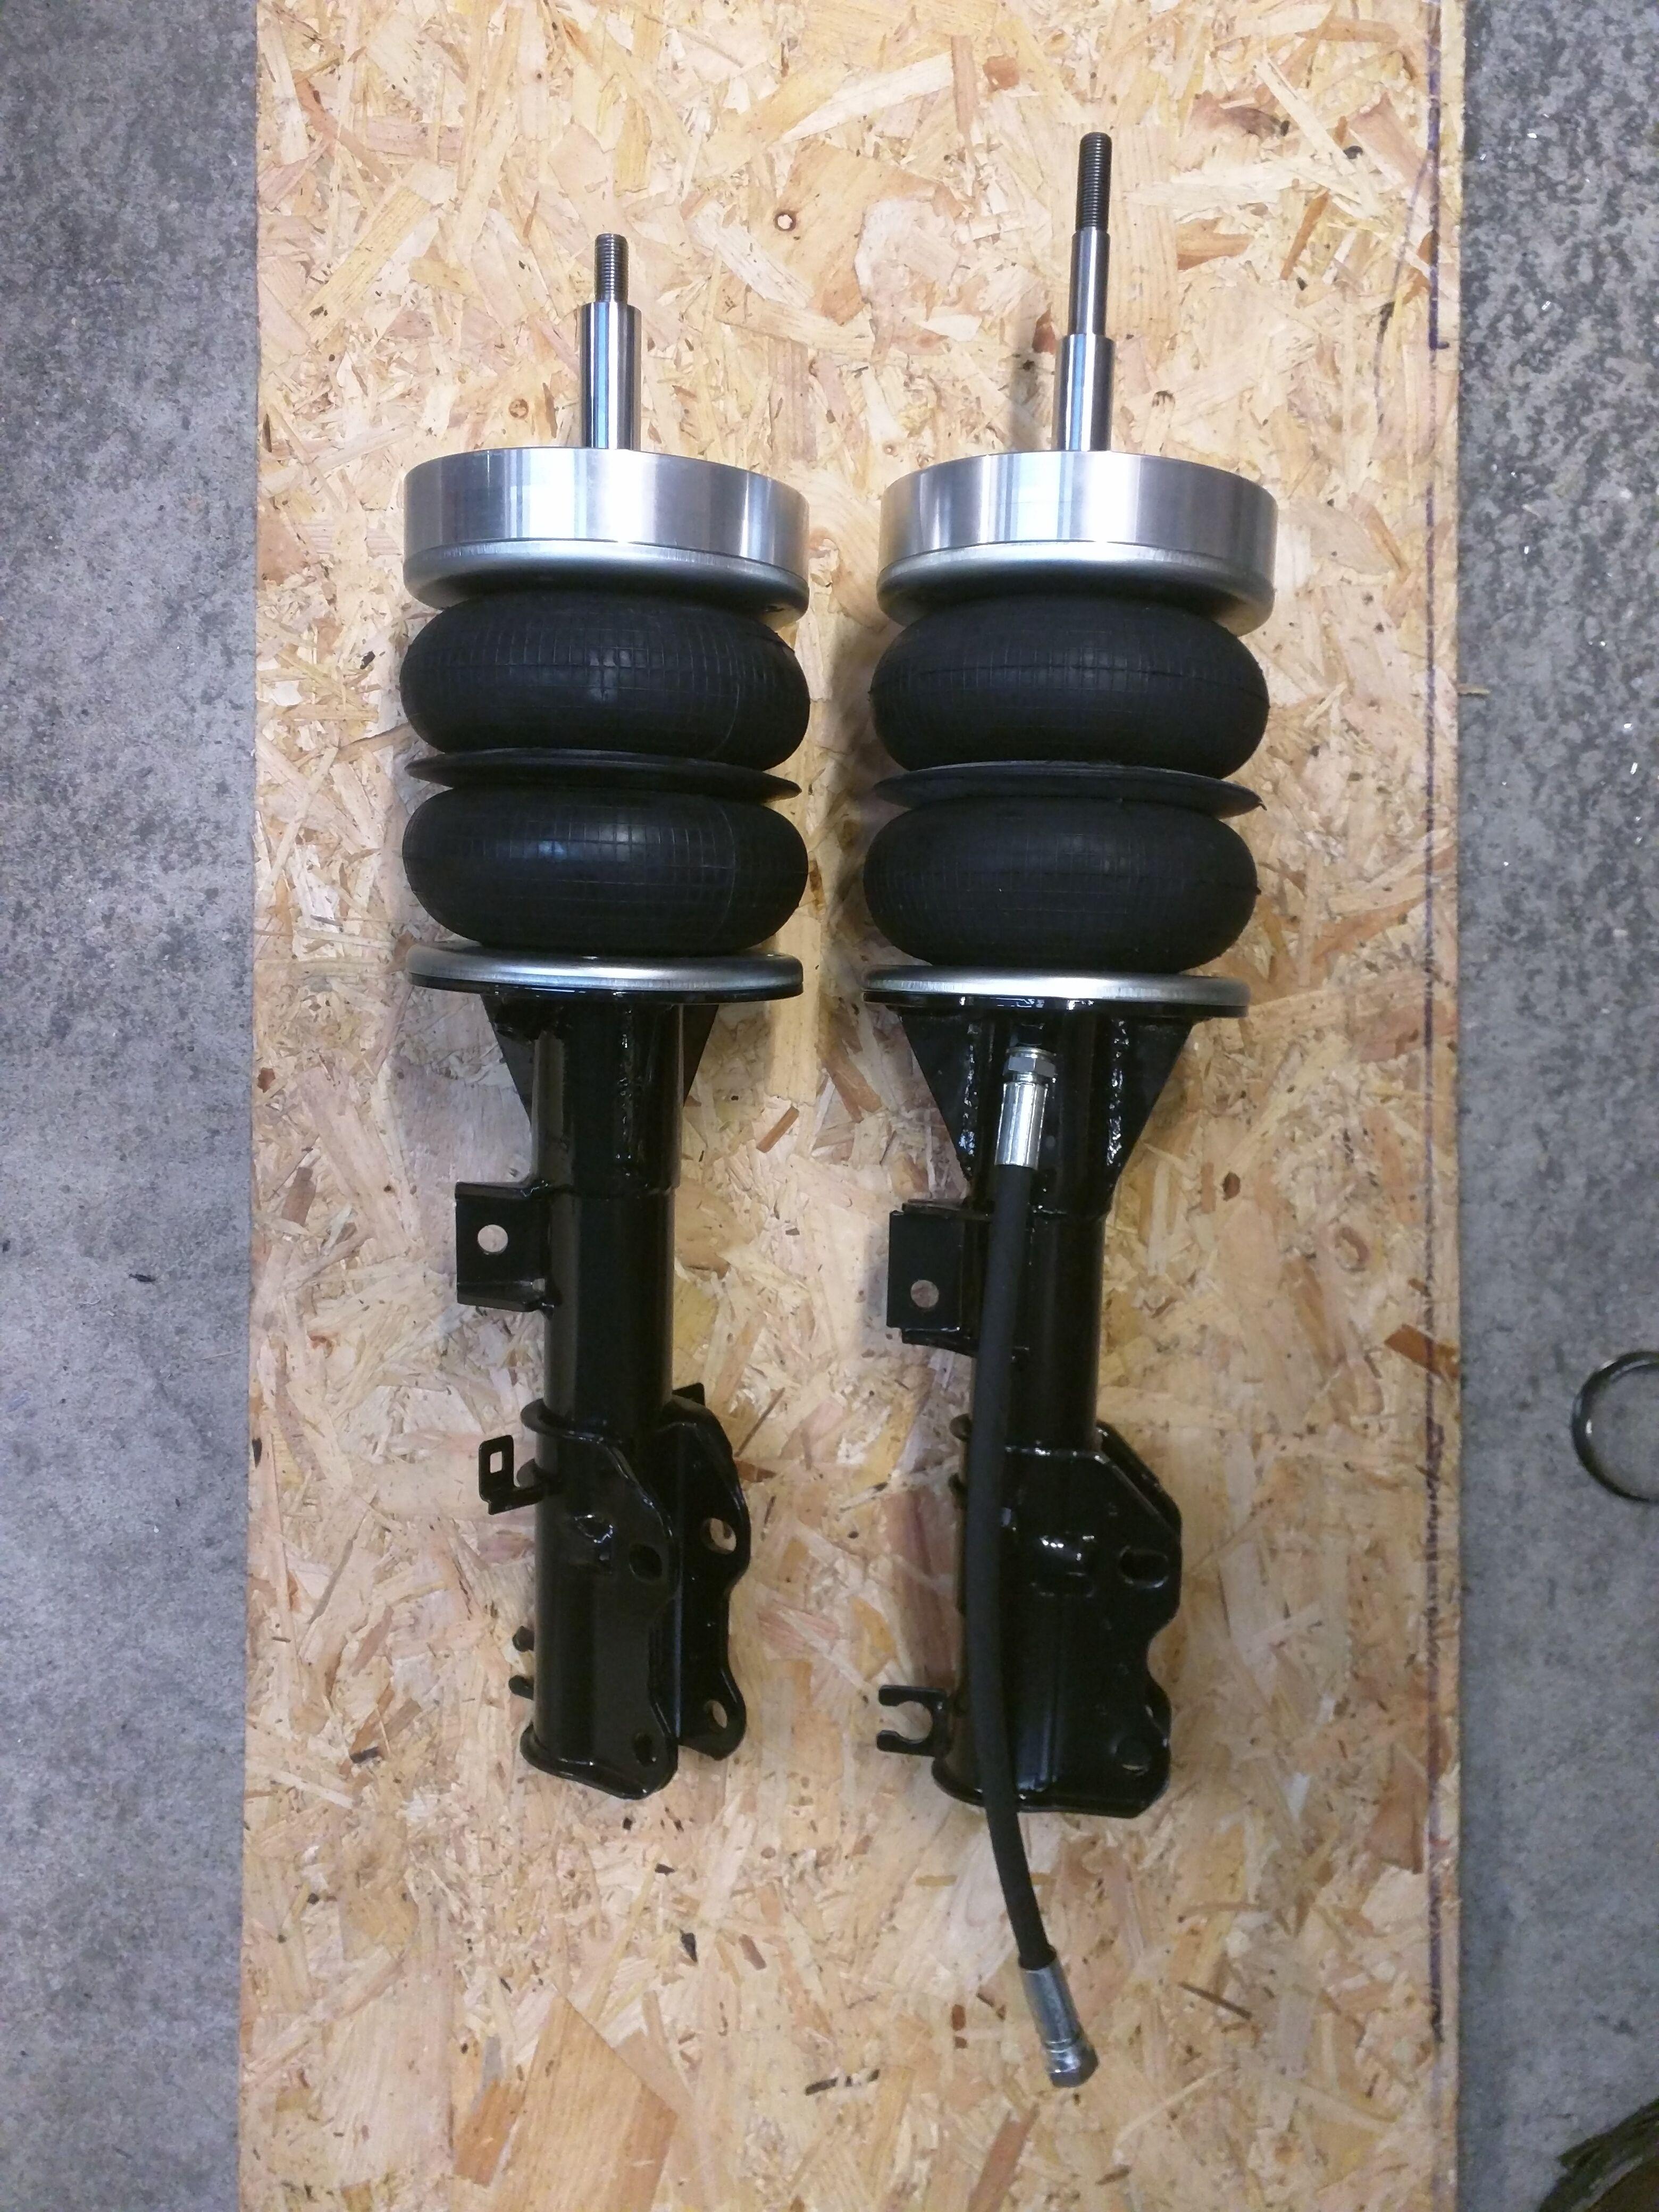 Mercedes Vito W639 front air suspension struts | UpDate SuM | The